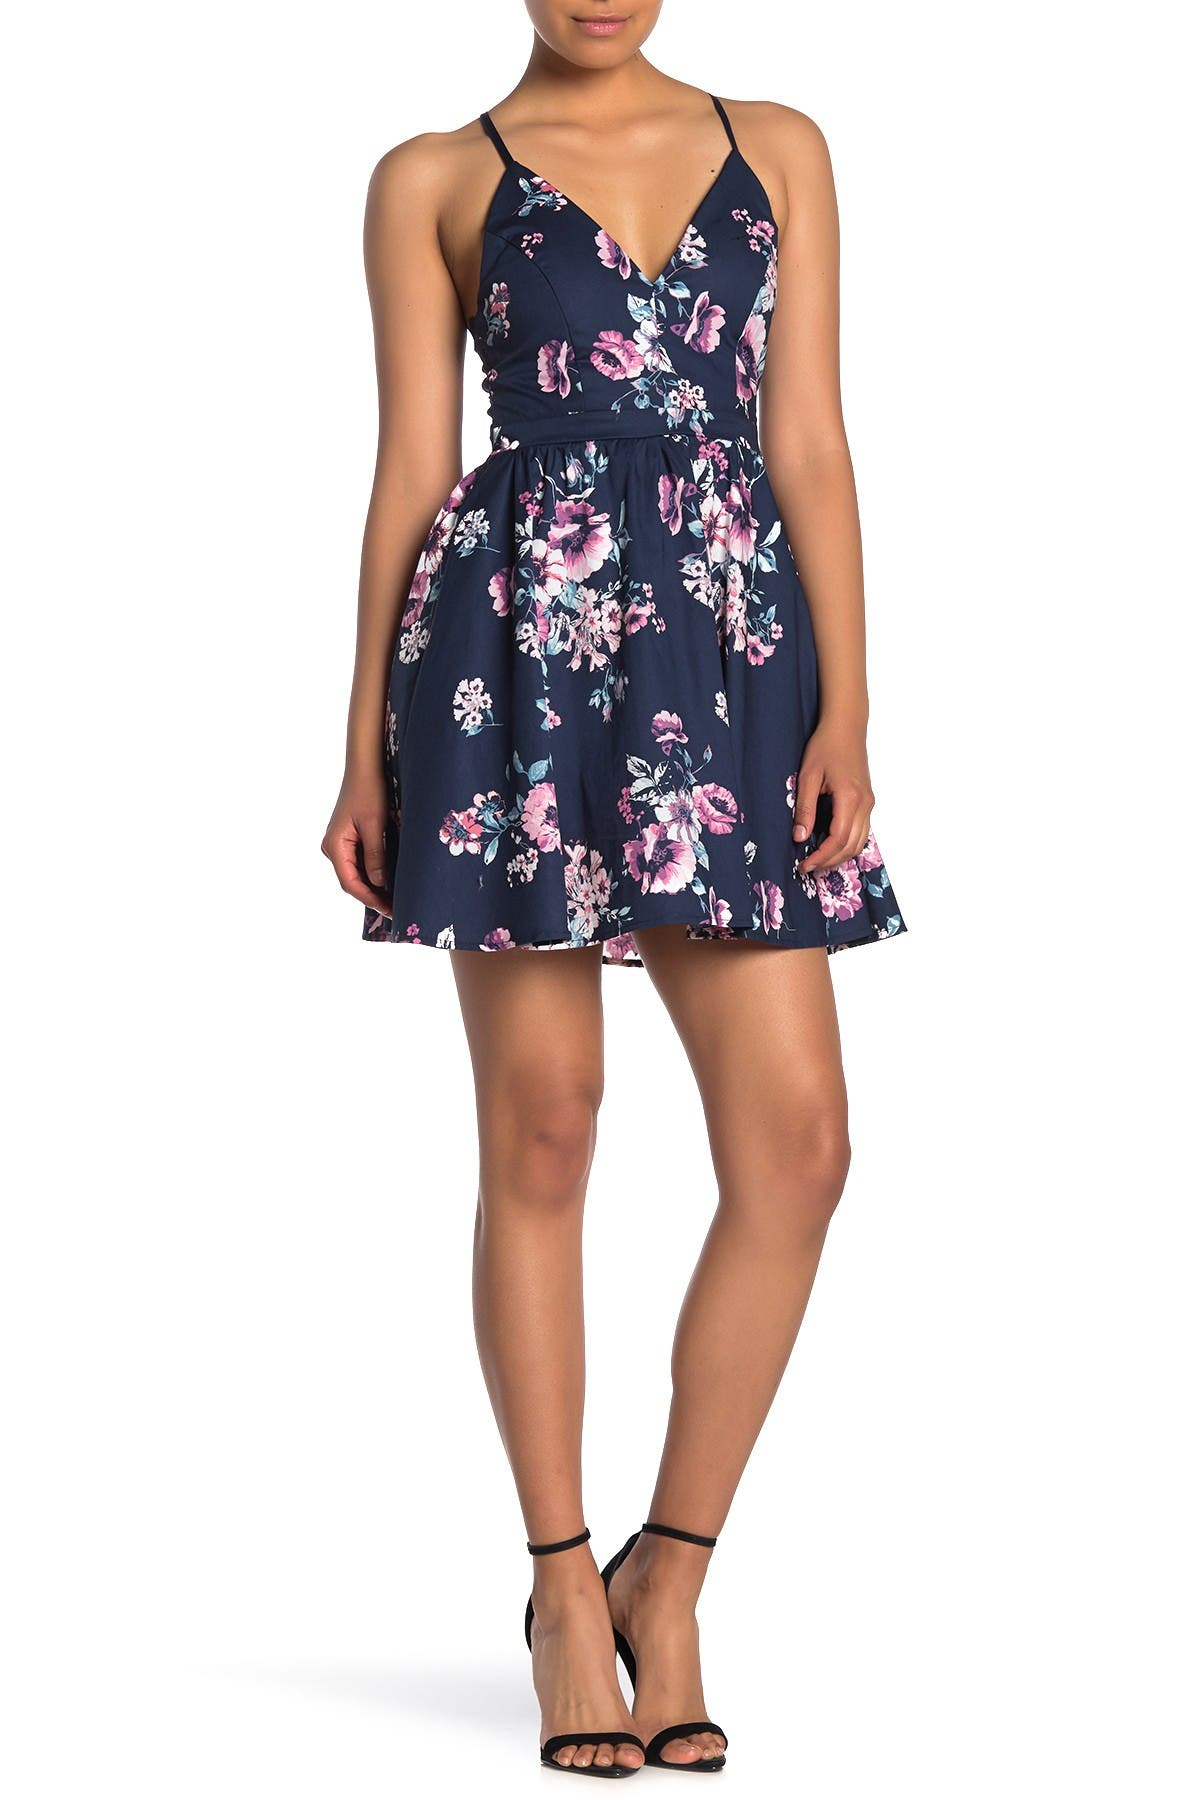 Image of Love, Nickie Lew Floral Print Lace Back Skater Dress